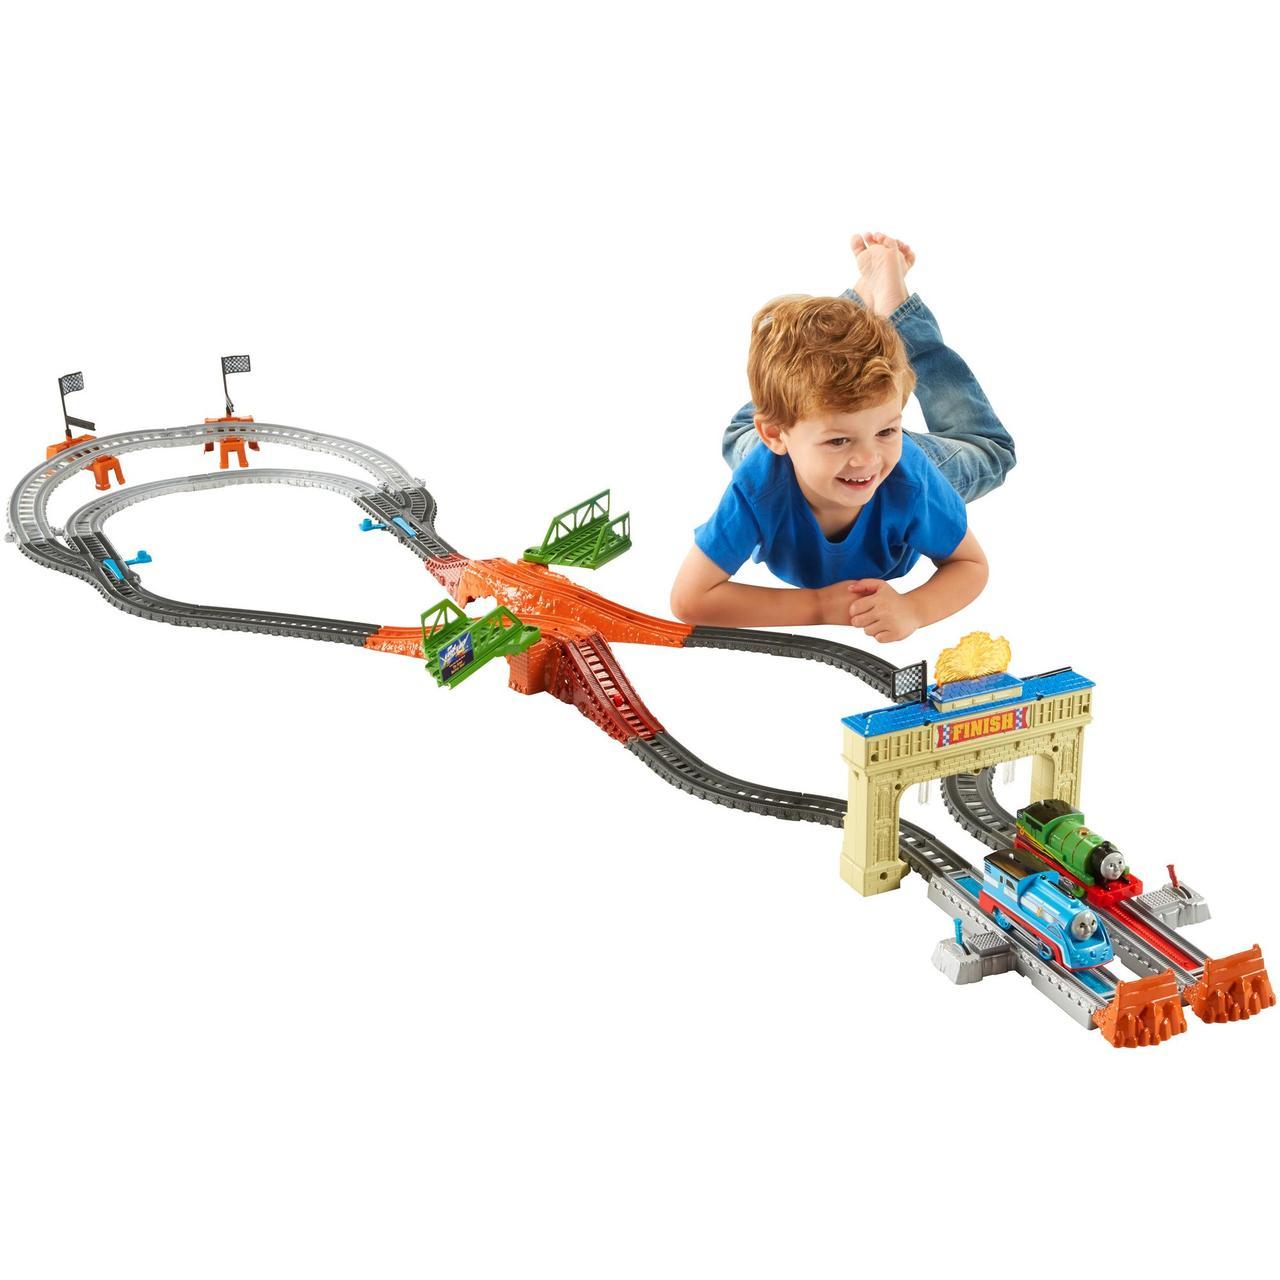 Thomas & Friends™ TrackMaster™ Thomas & Percy's Railway Race Set (Большая гонка)  Бесплатная доставка.